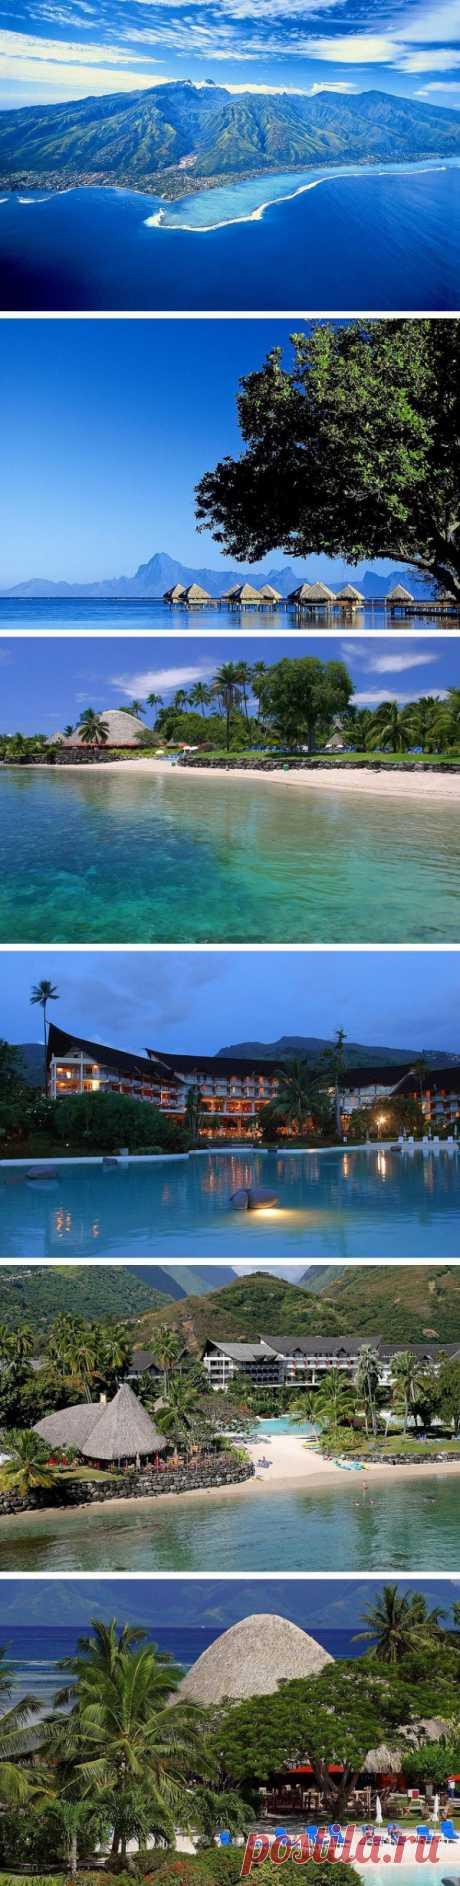 Tocar el trozo de la naturaleza virgen, prístina. La isla Tahití, la Polinesia francesa